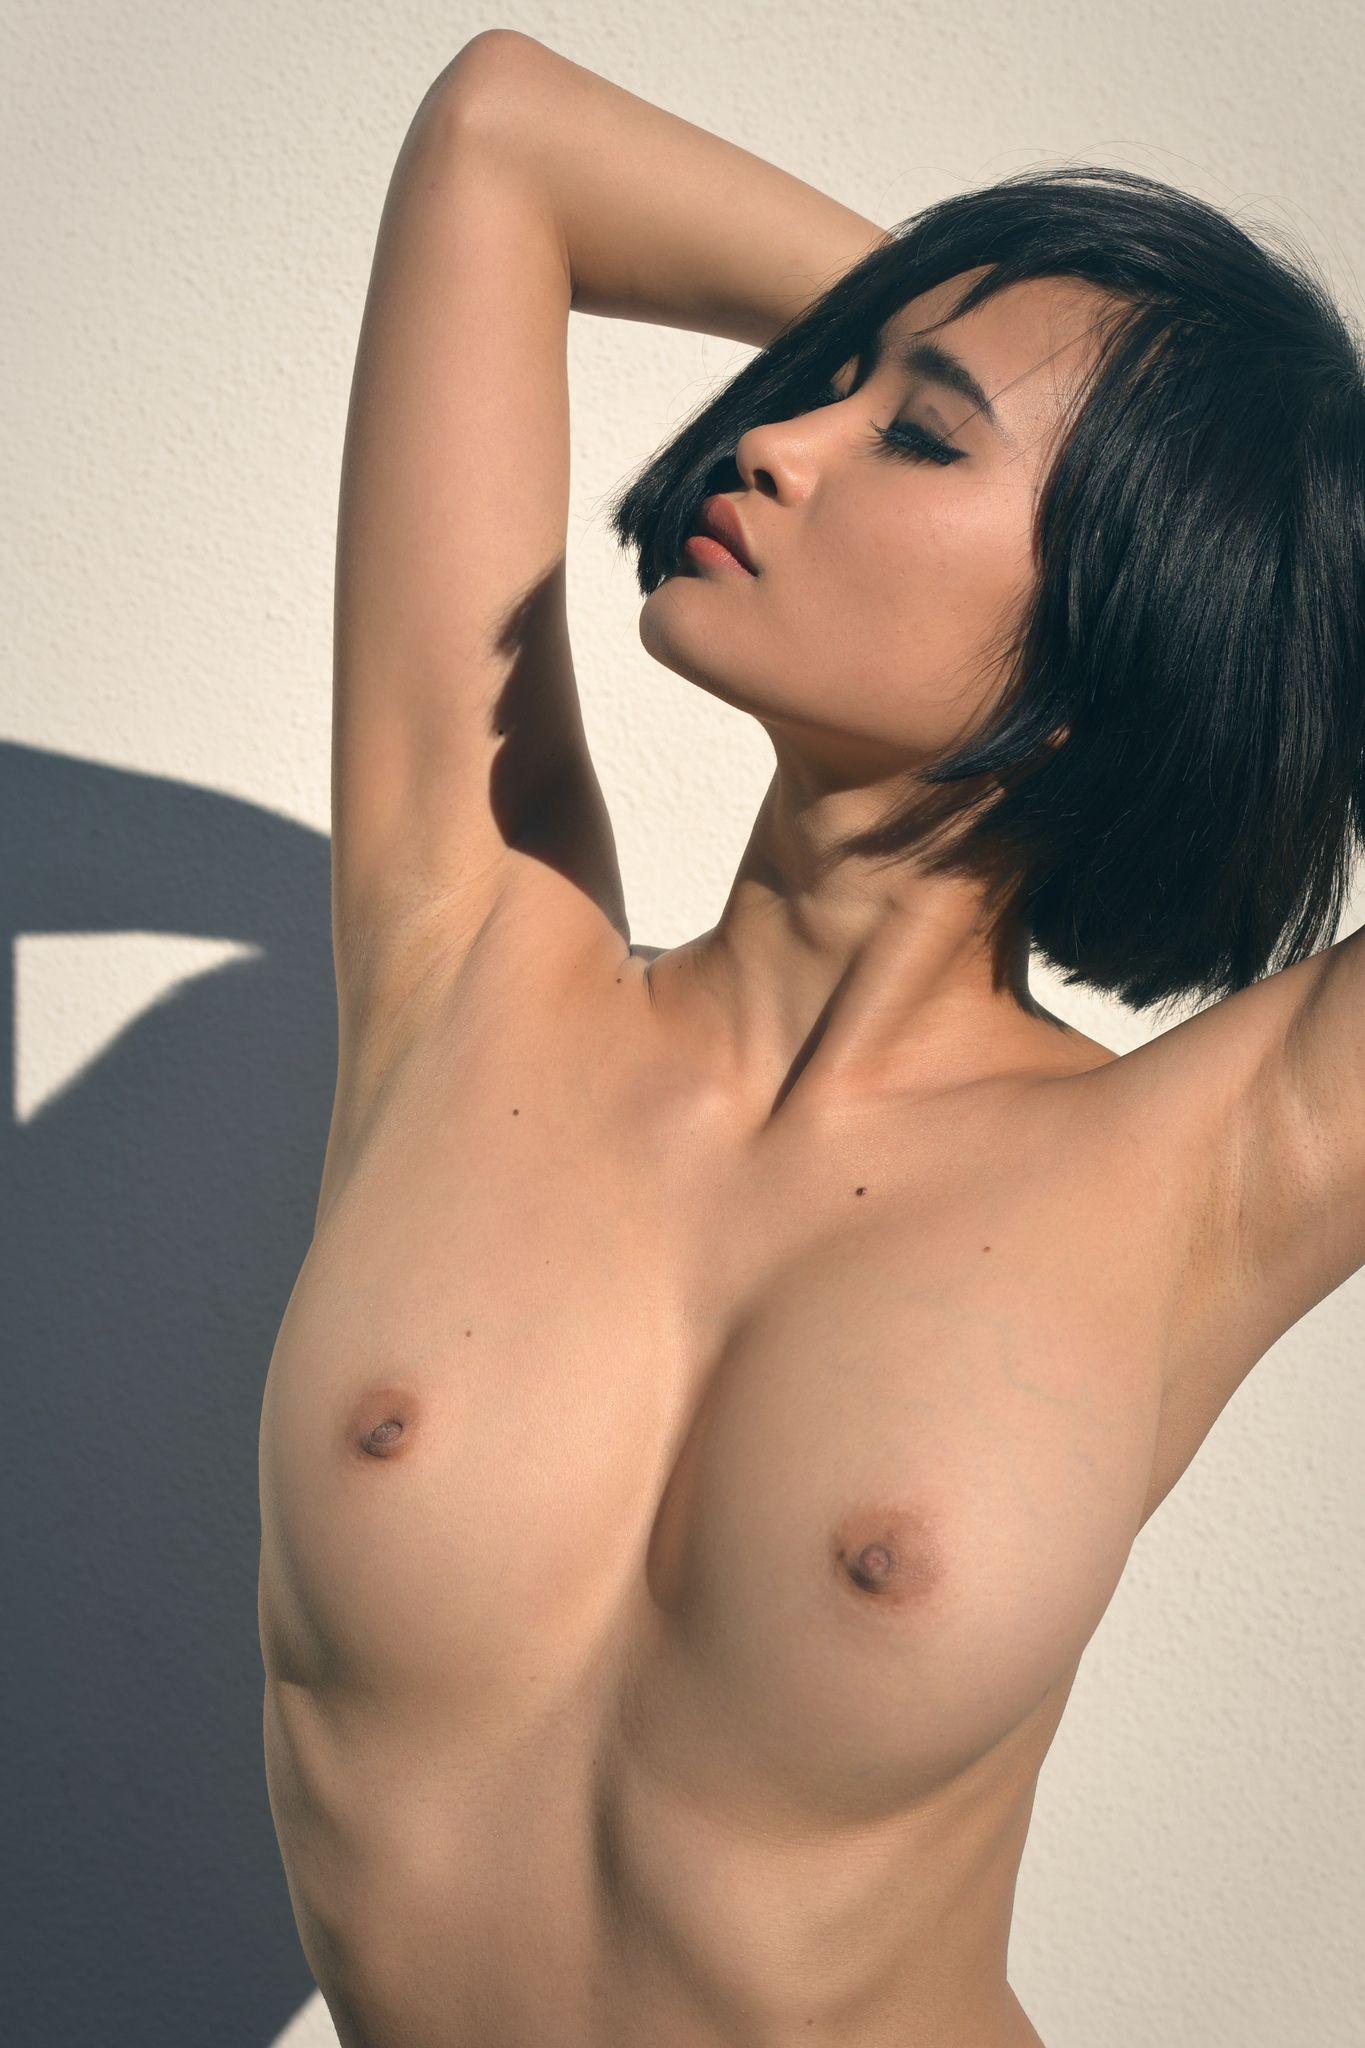 Short hair asian women with naked breast xpost rjapanpornstars